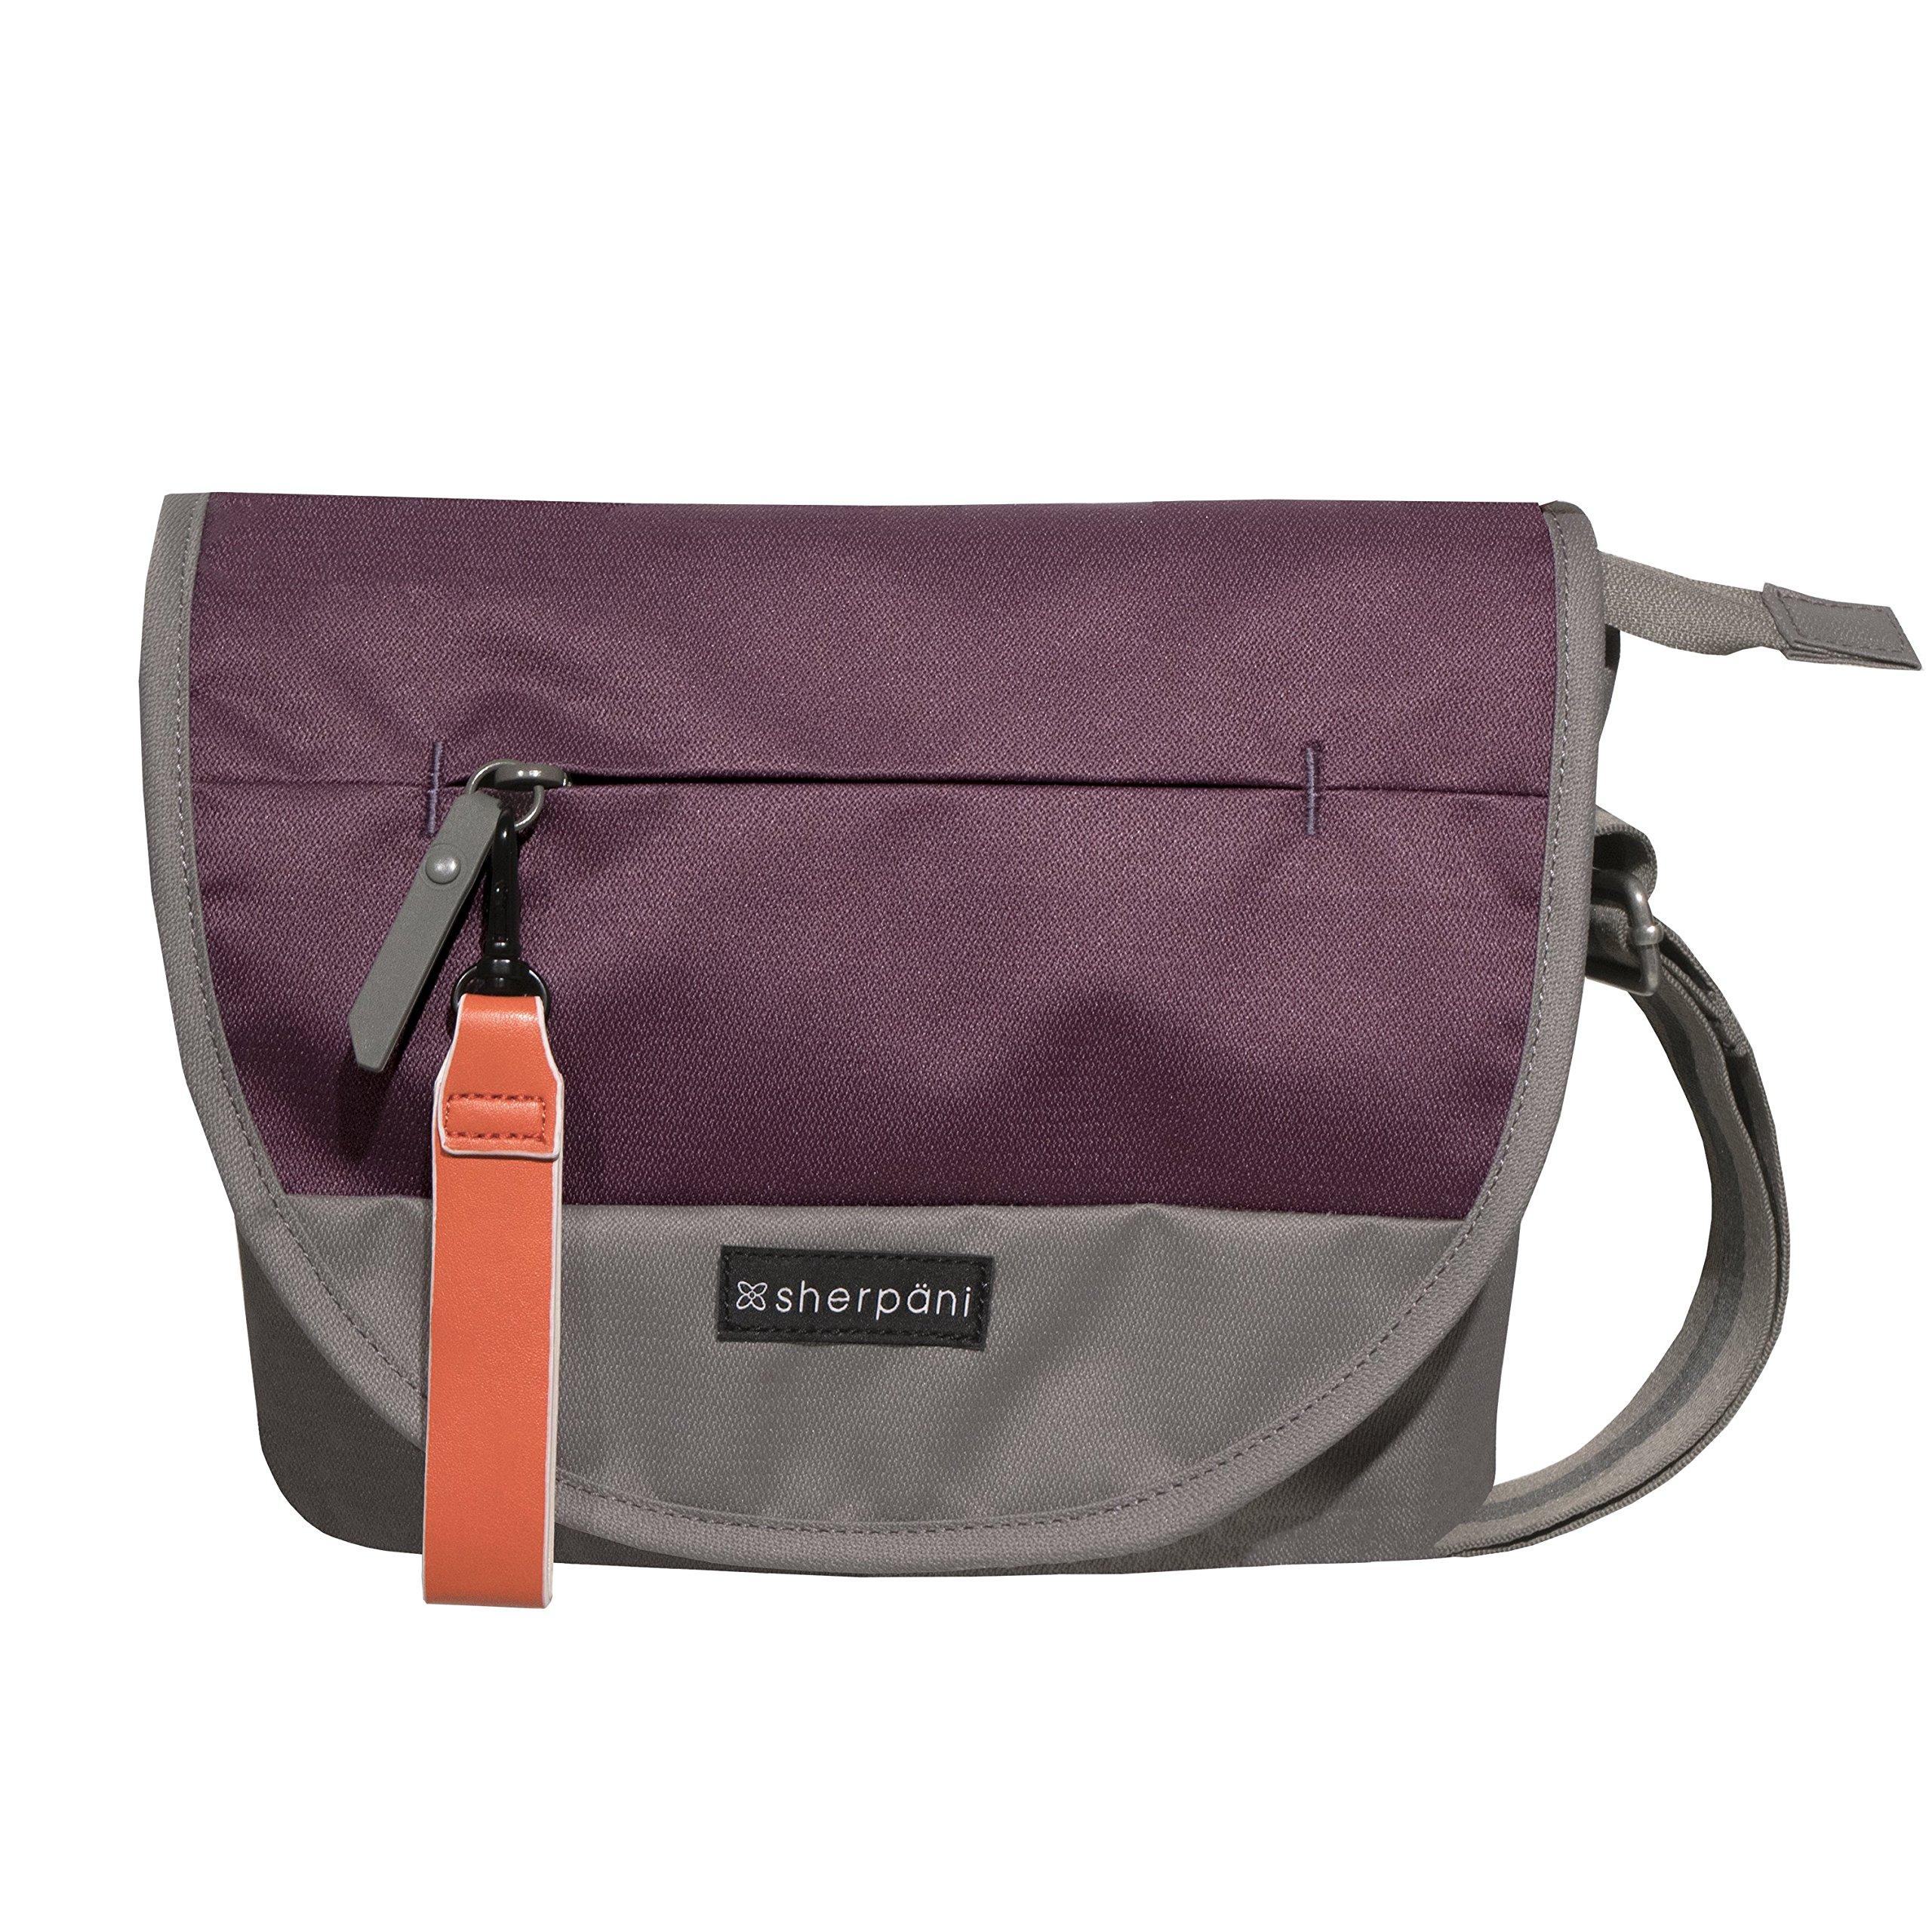 Sherpani Women's 18-milli-04-11-0 Cross Body Bag, Dahlia/Flint, One Size